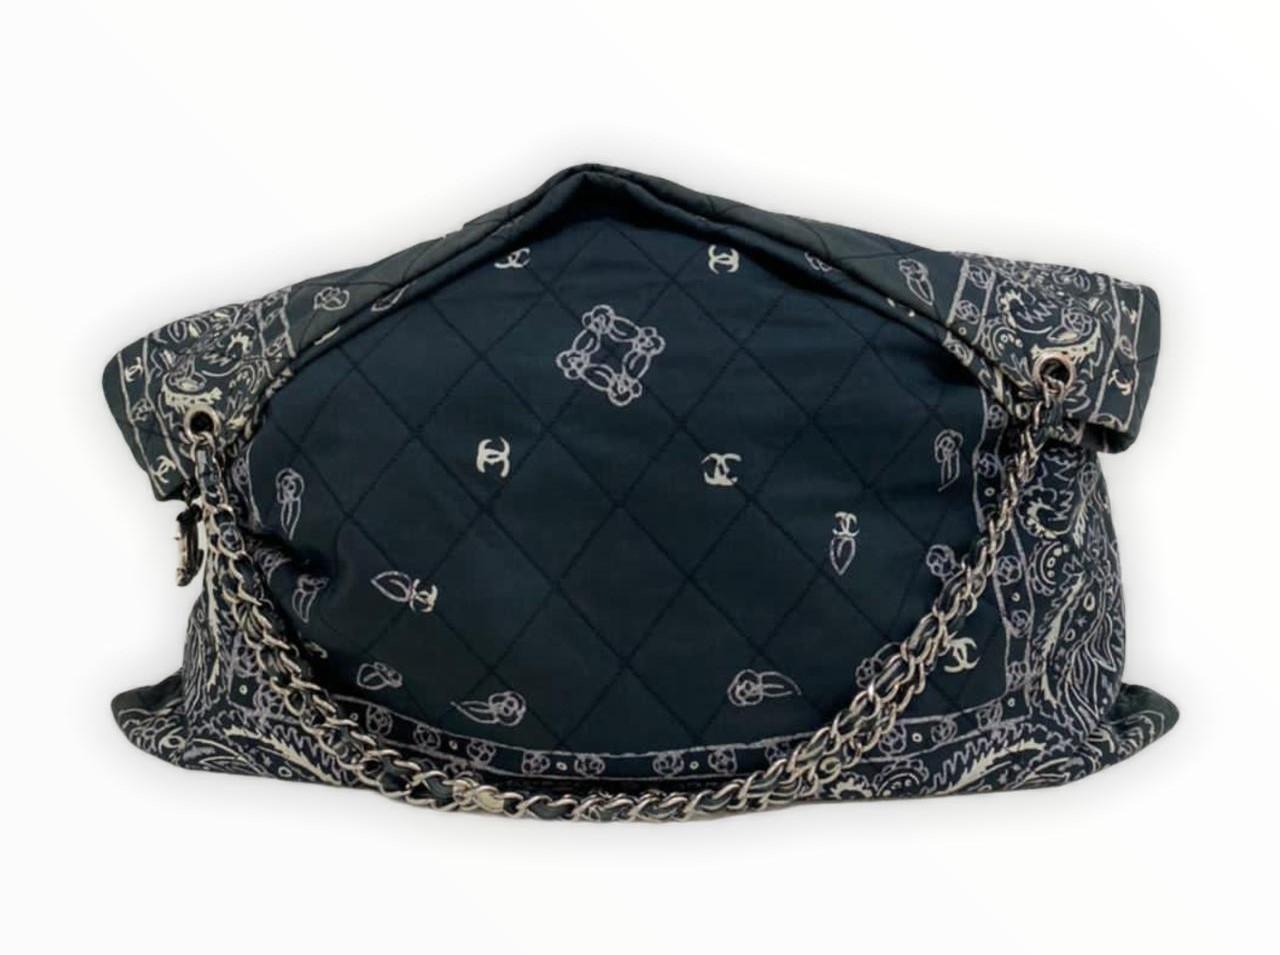 Bolsa Chanel Tecido Shoulder